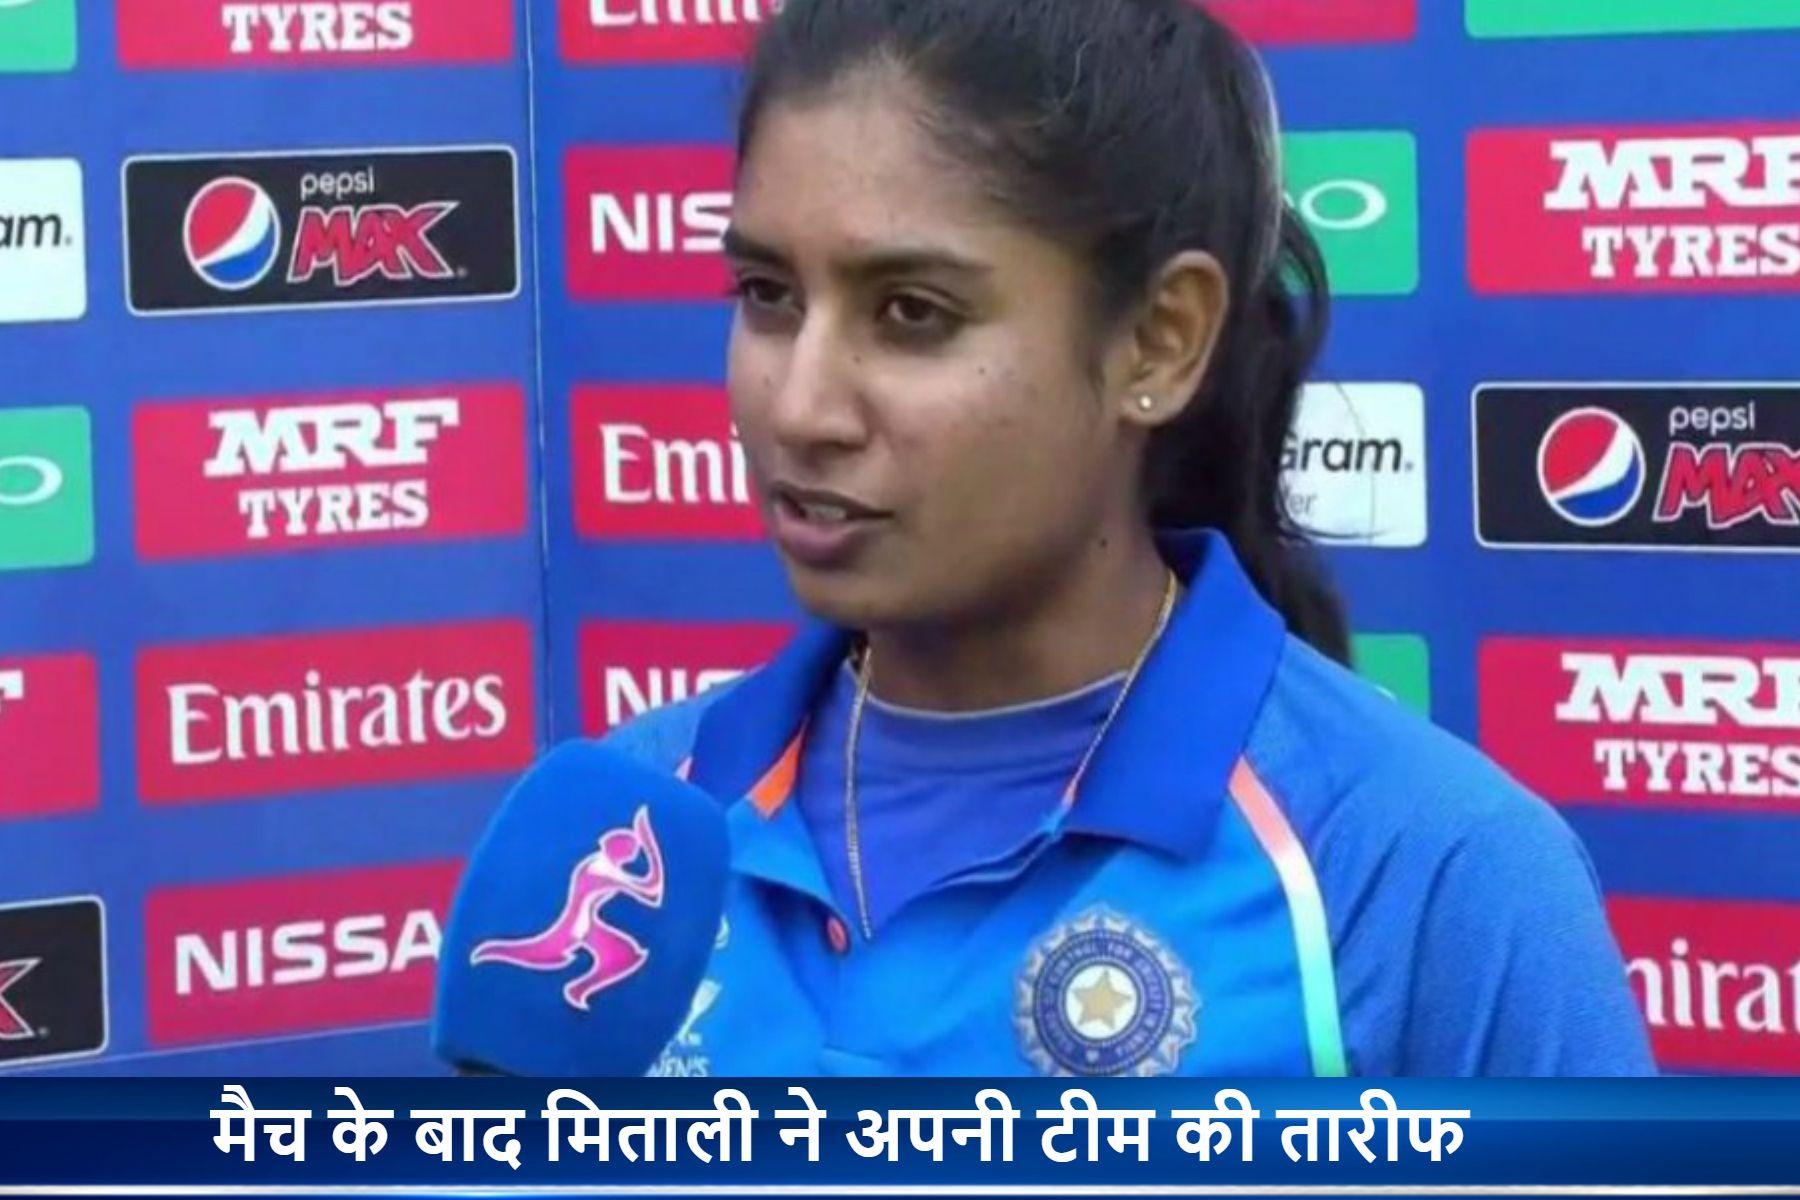 अब वुमेंस टीम को मिलती रहेगी तवज्जों: मिताली राज for more info.....=pratinidhi.tv/Top_Story.aspx?Nid=8925